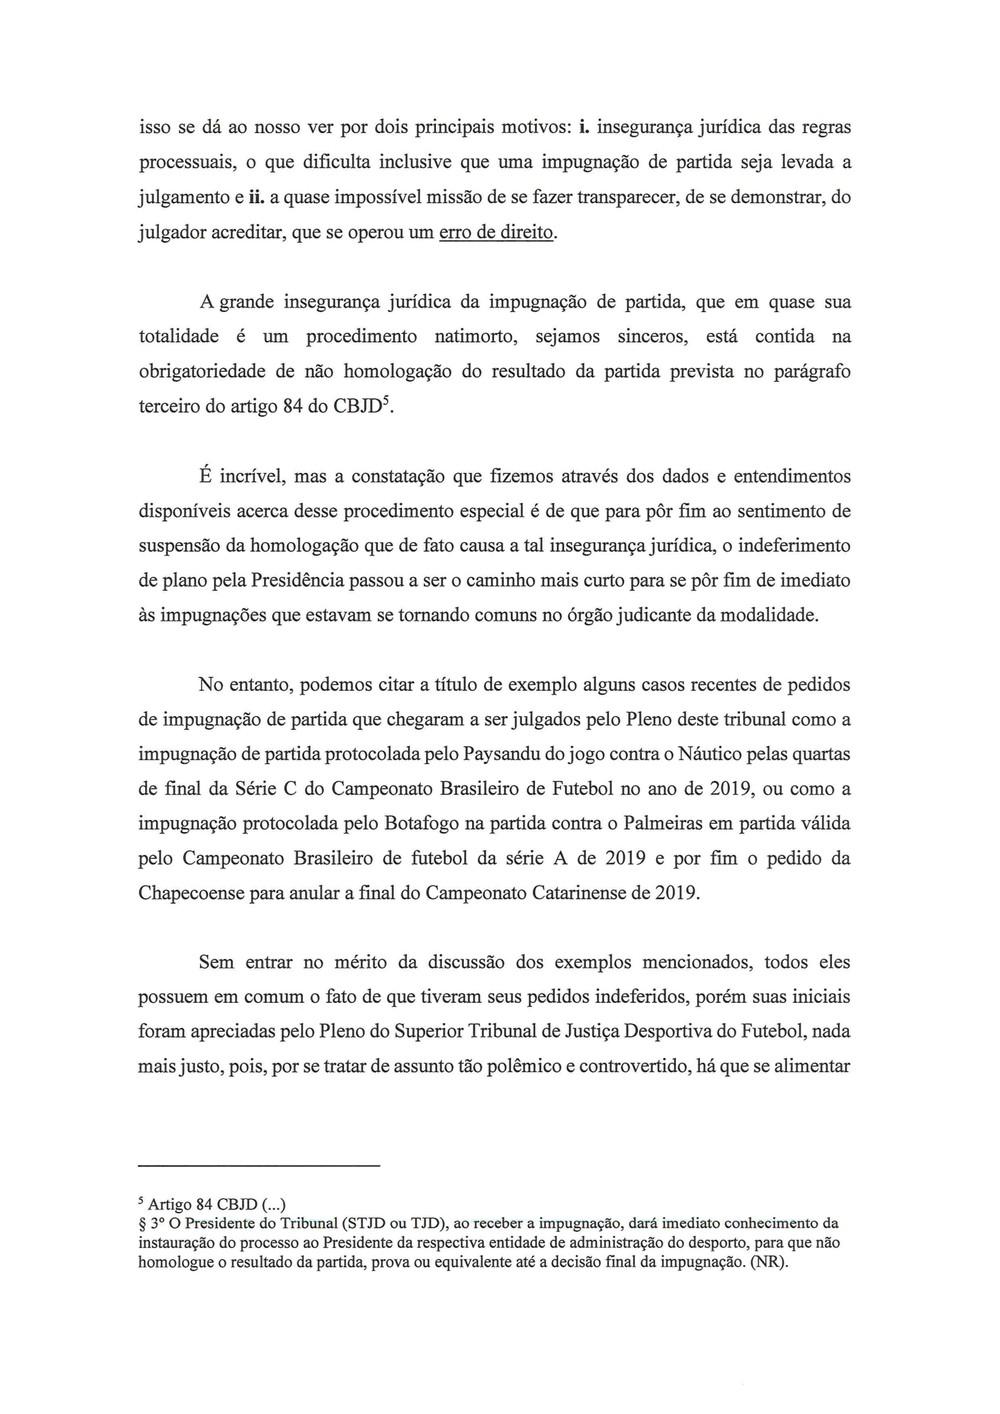 stjd-medida-inominada-vasco-x-inter-05